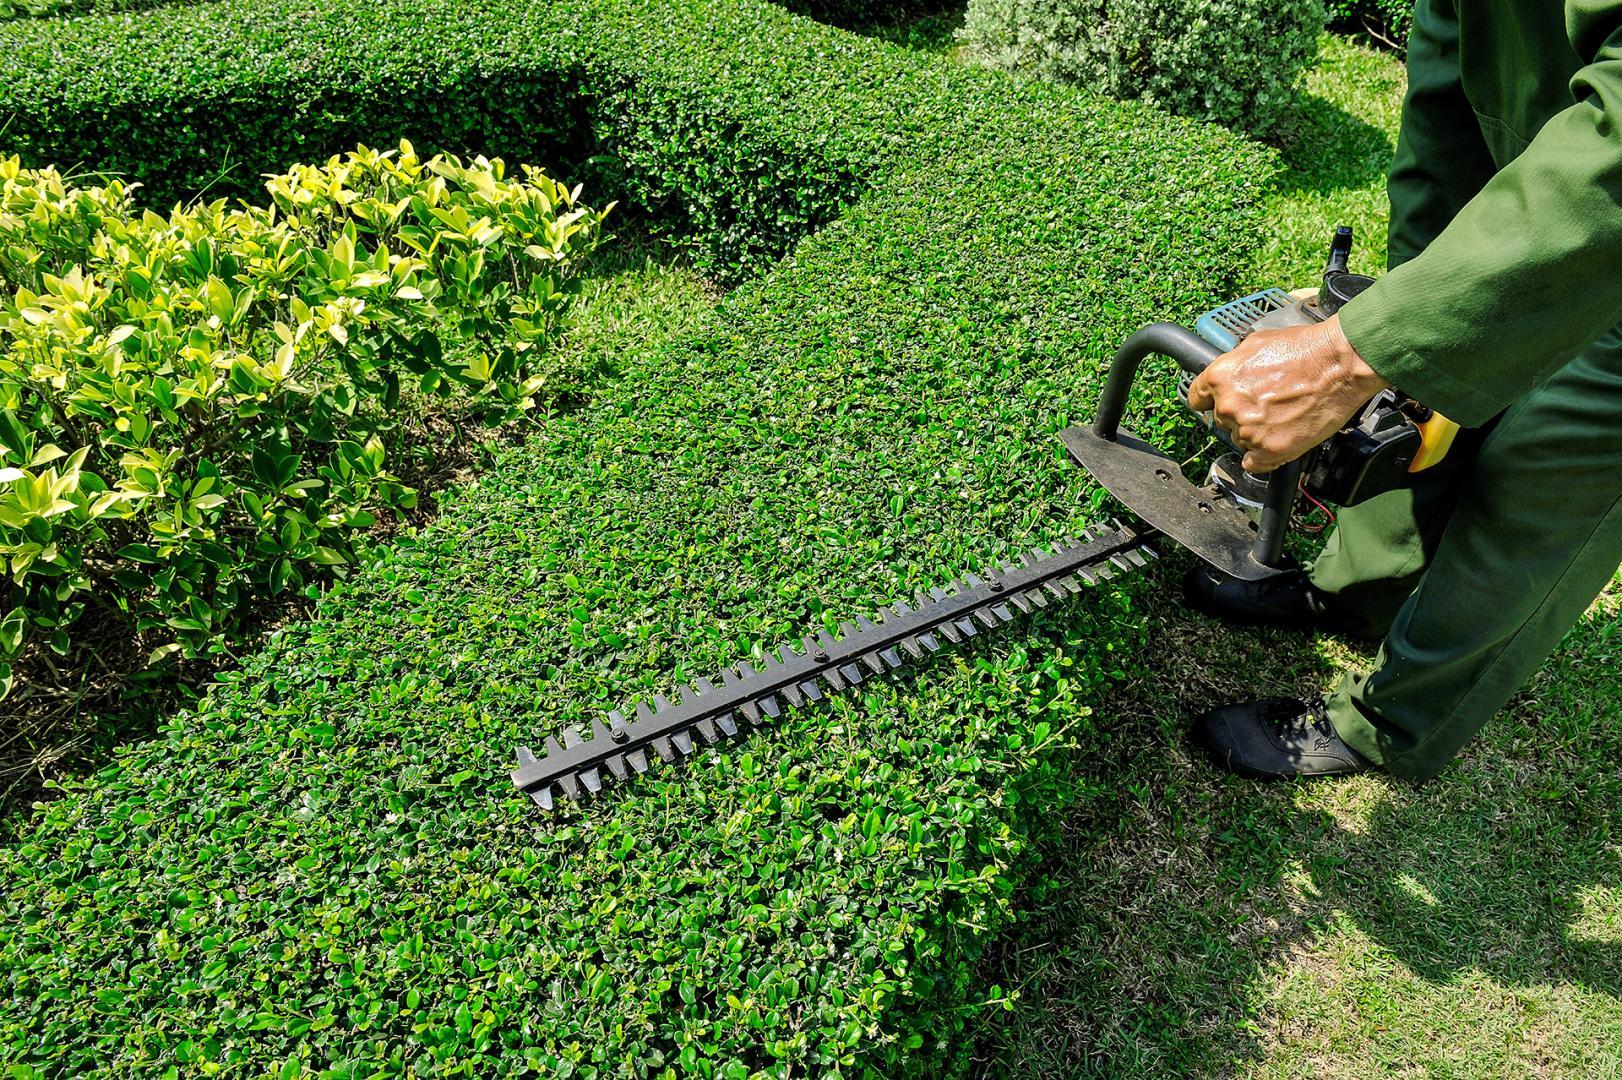 Entretien espace vert jardin aménagement espace vert